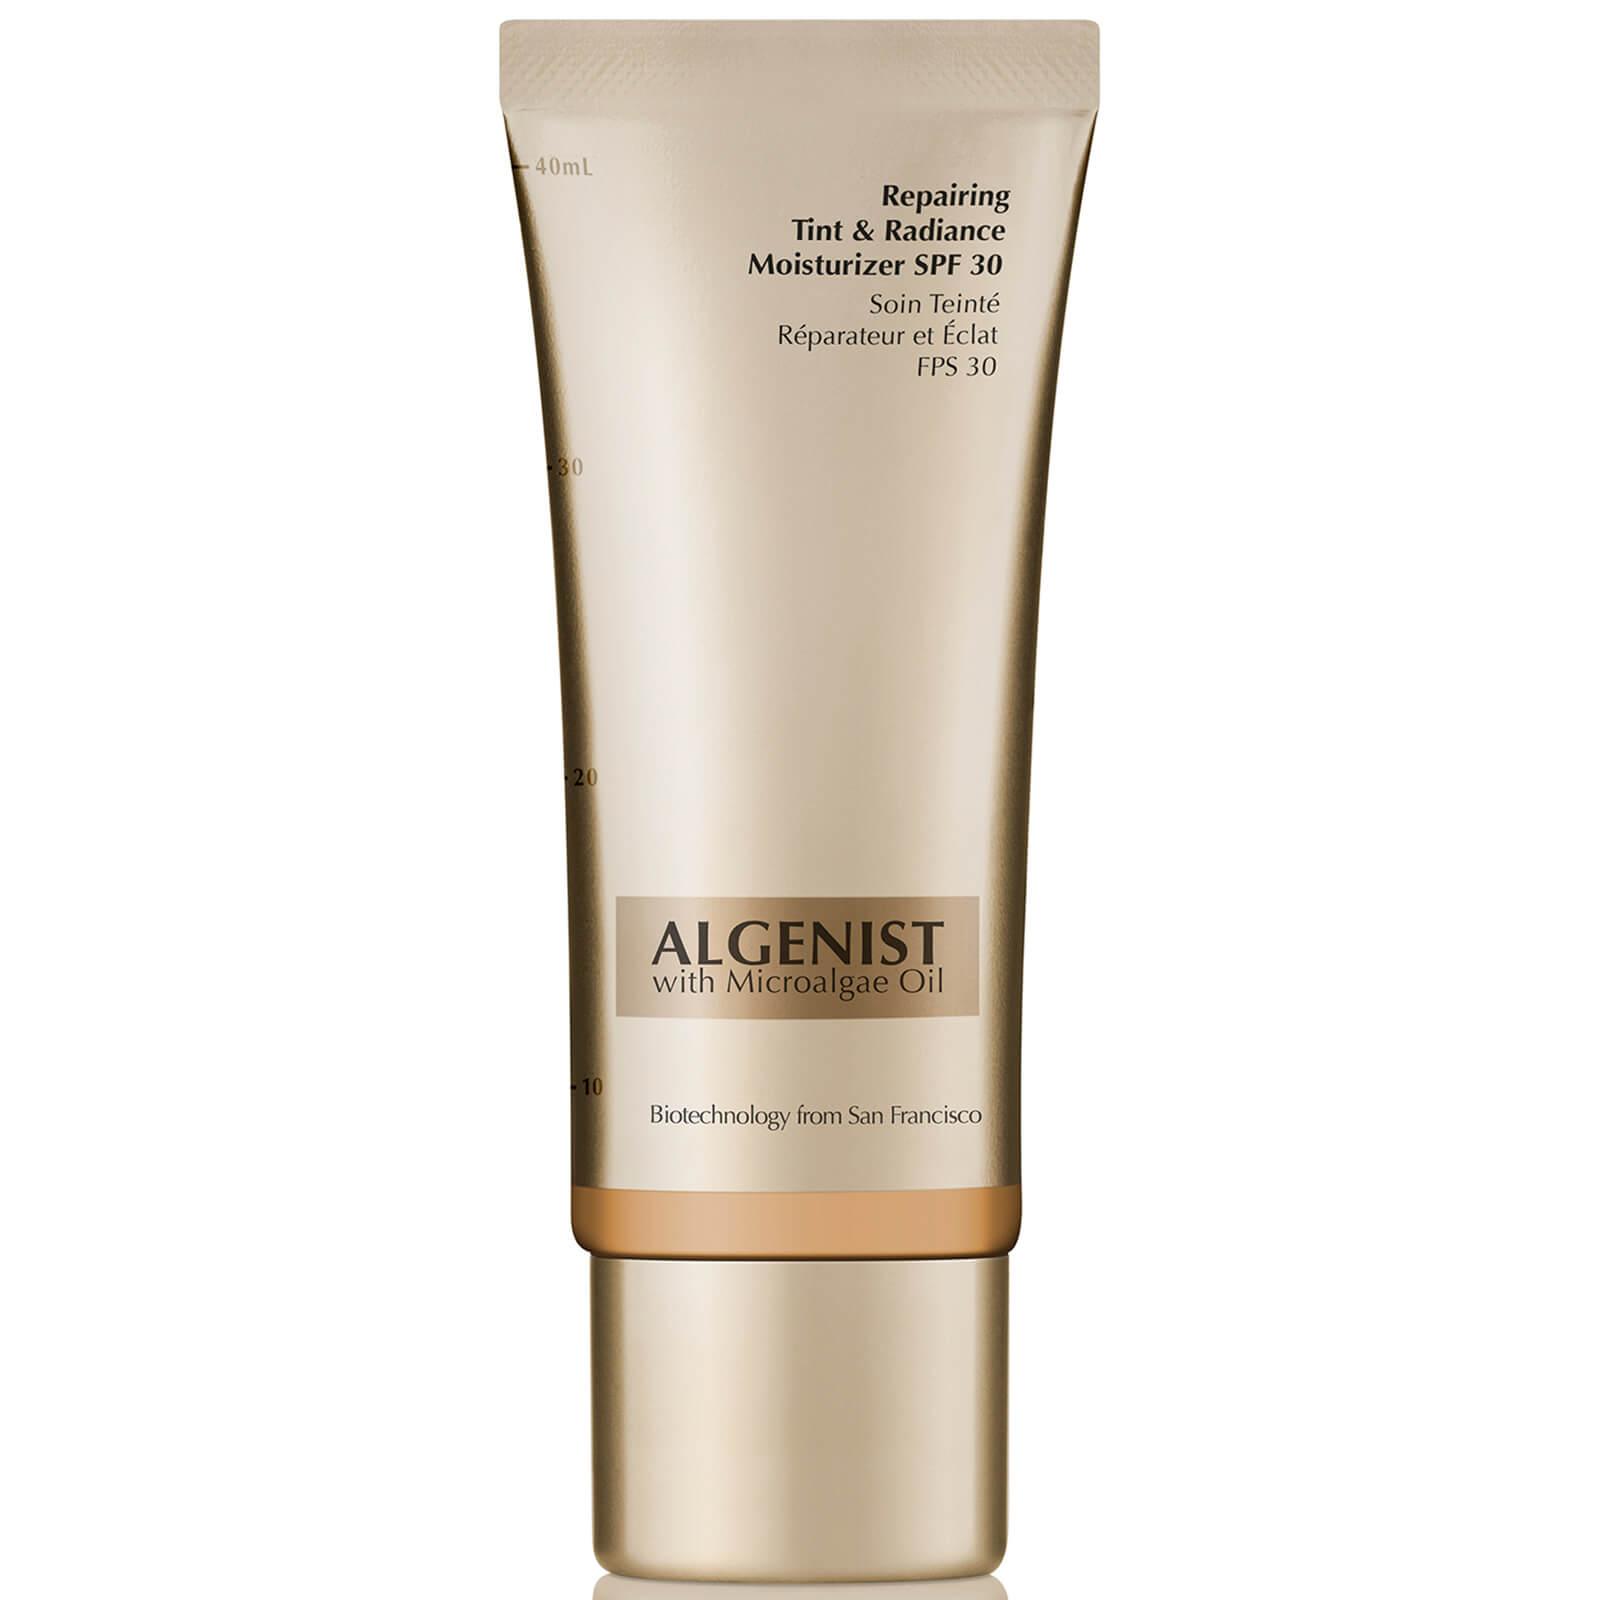 algenist repairing tint & radiance spf30 moisturiser 40ml (various shades) - tan